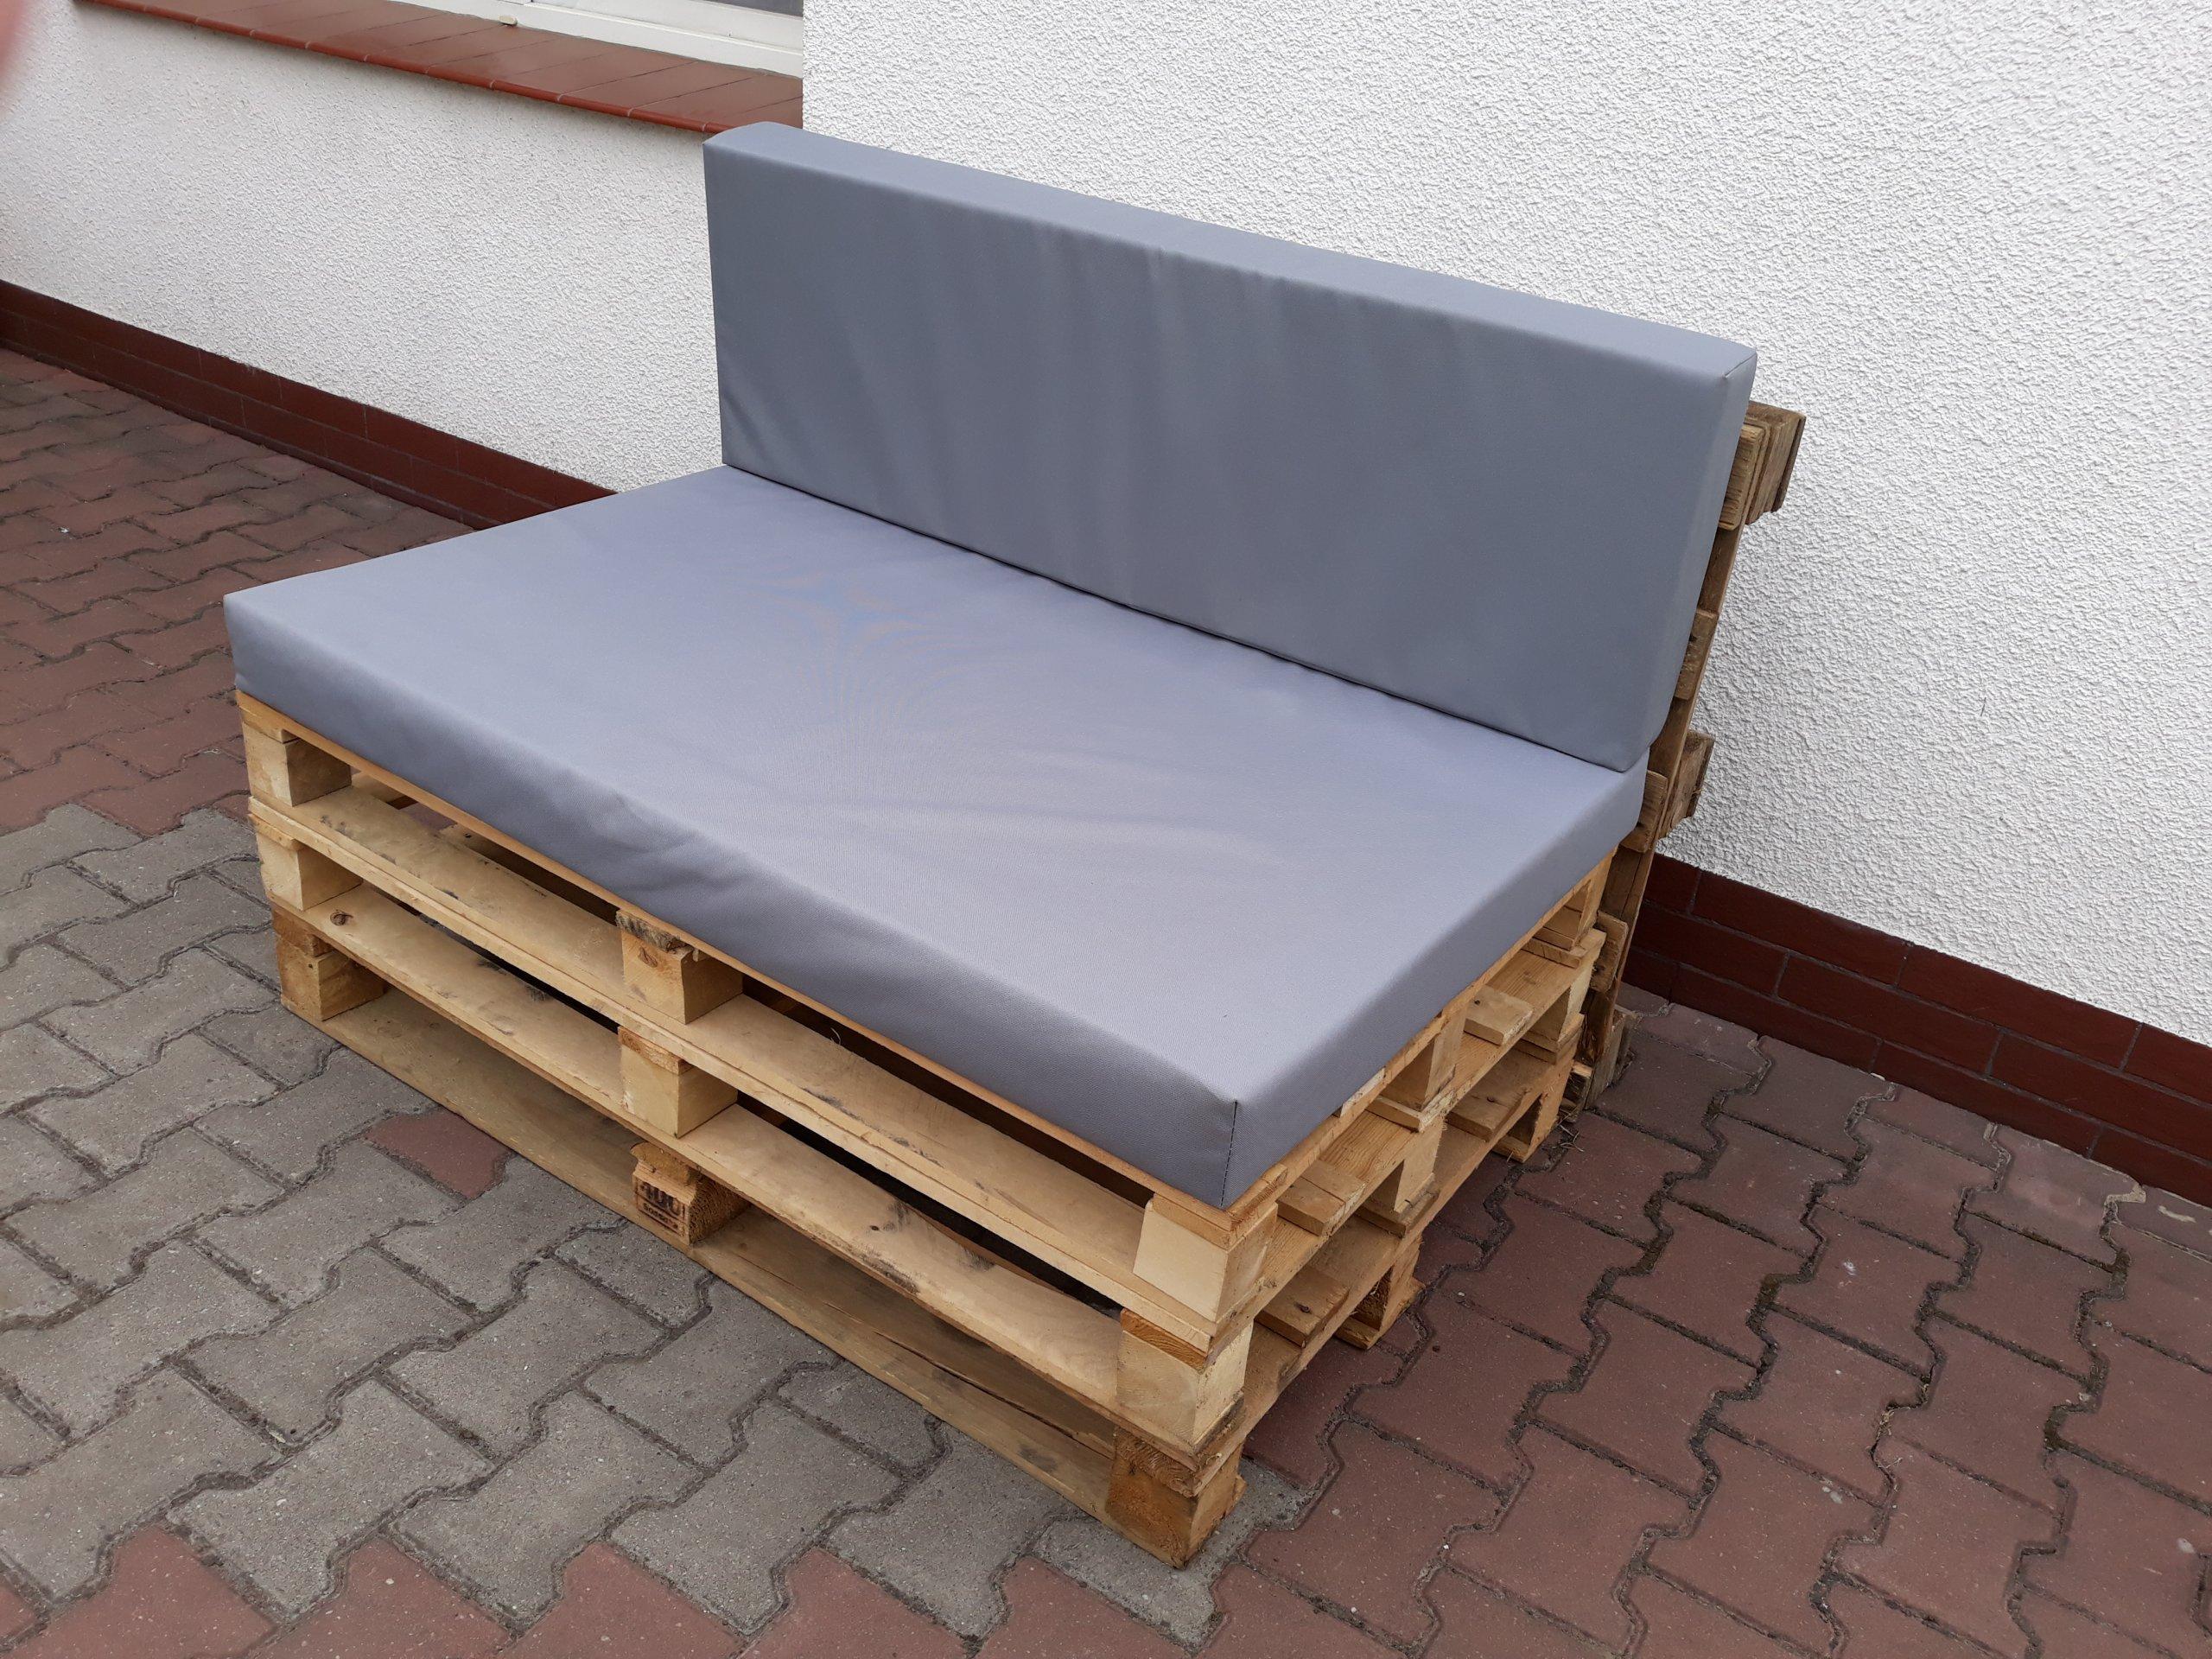 Poduszka Poducha na meble z palet 120x80 KOMPLET